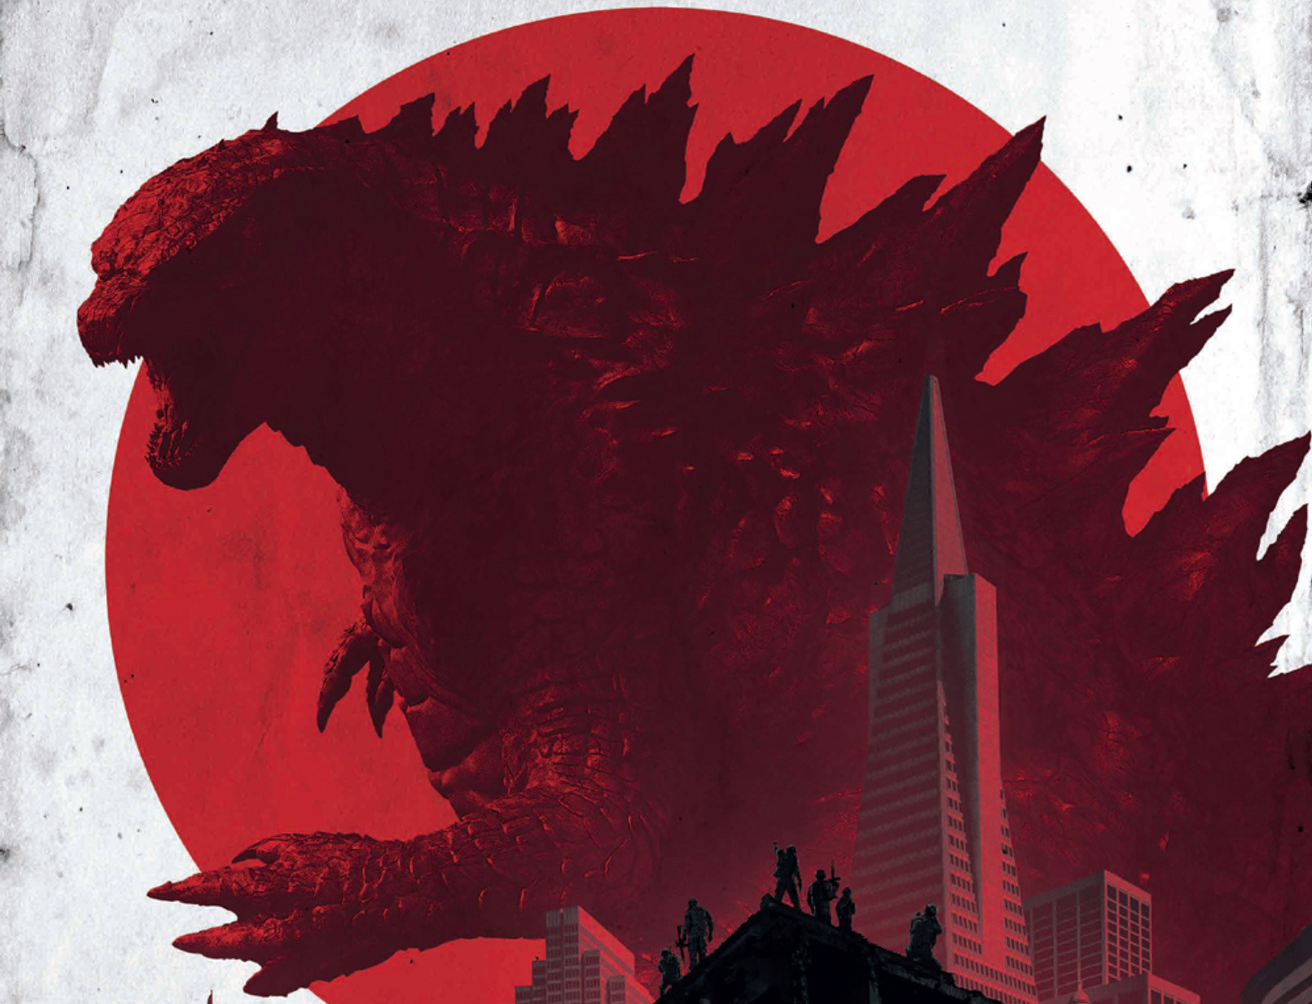 Godzilla Anime Movie Set for 2017 - GeekFeed.com